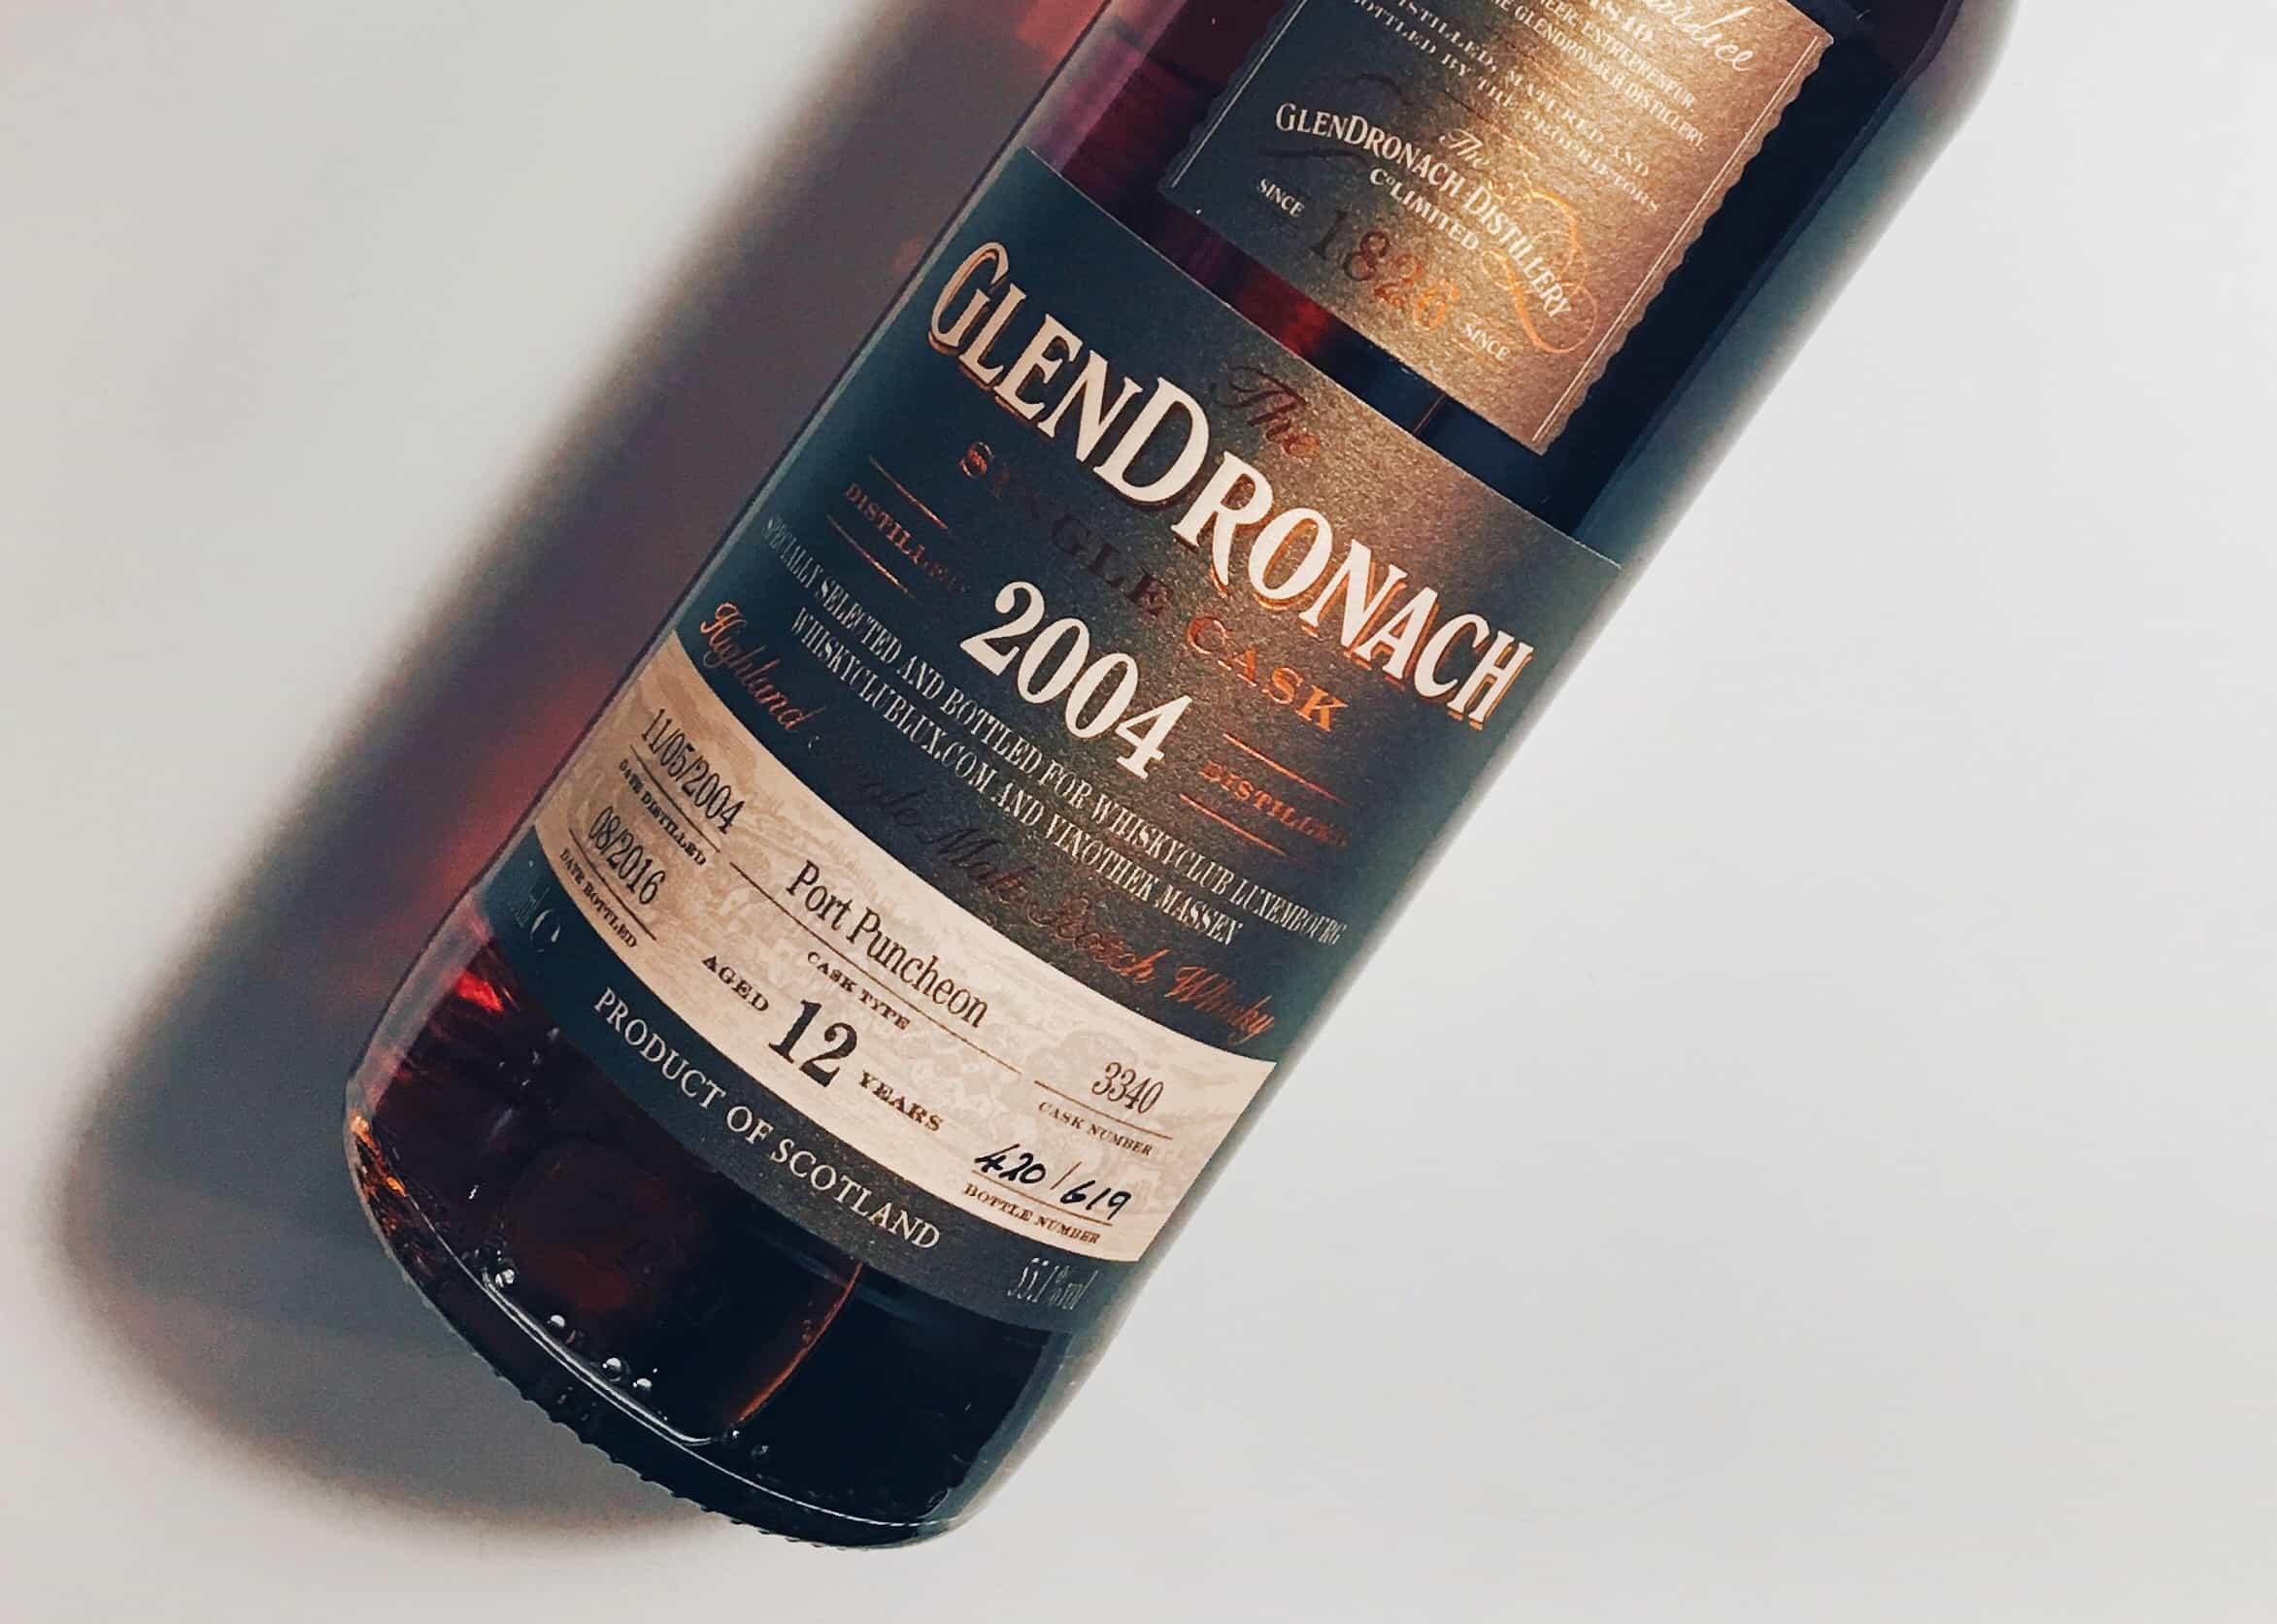 GlenDronach 12 Year Old Single Cask Port Puncheon